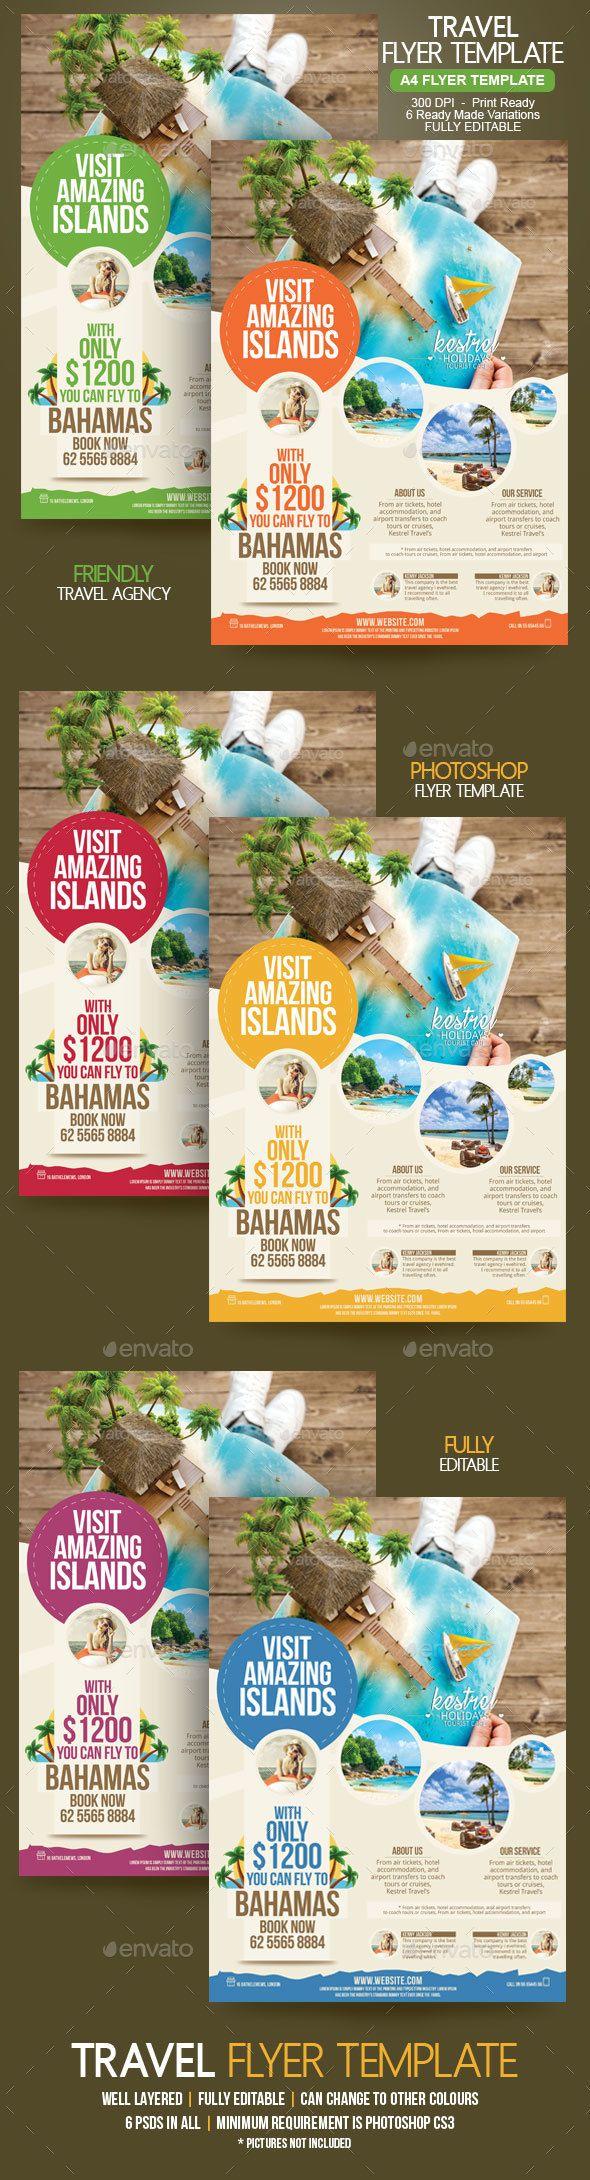 Travel #Flyer - Holidays #Events Download here:  https://graphicriver.net/item/travel-flyer/20145197?ref=alena994